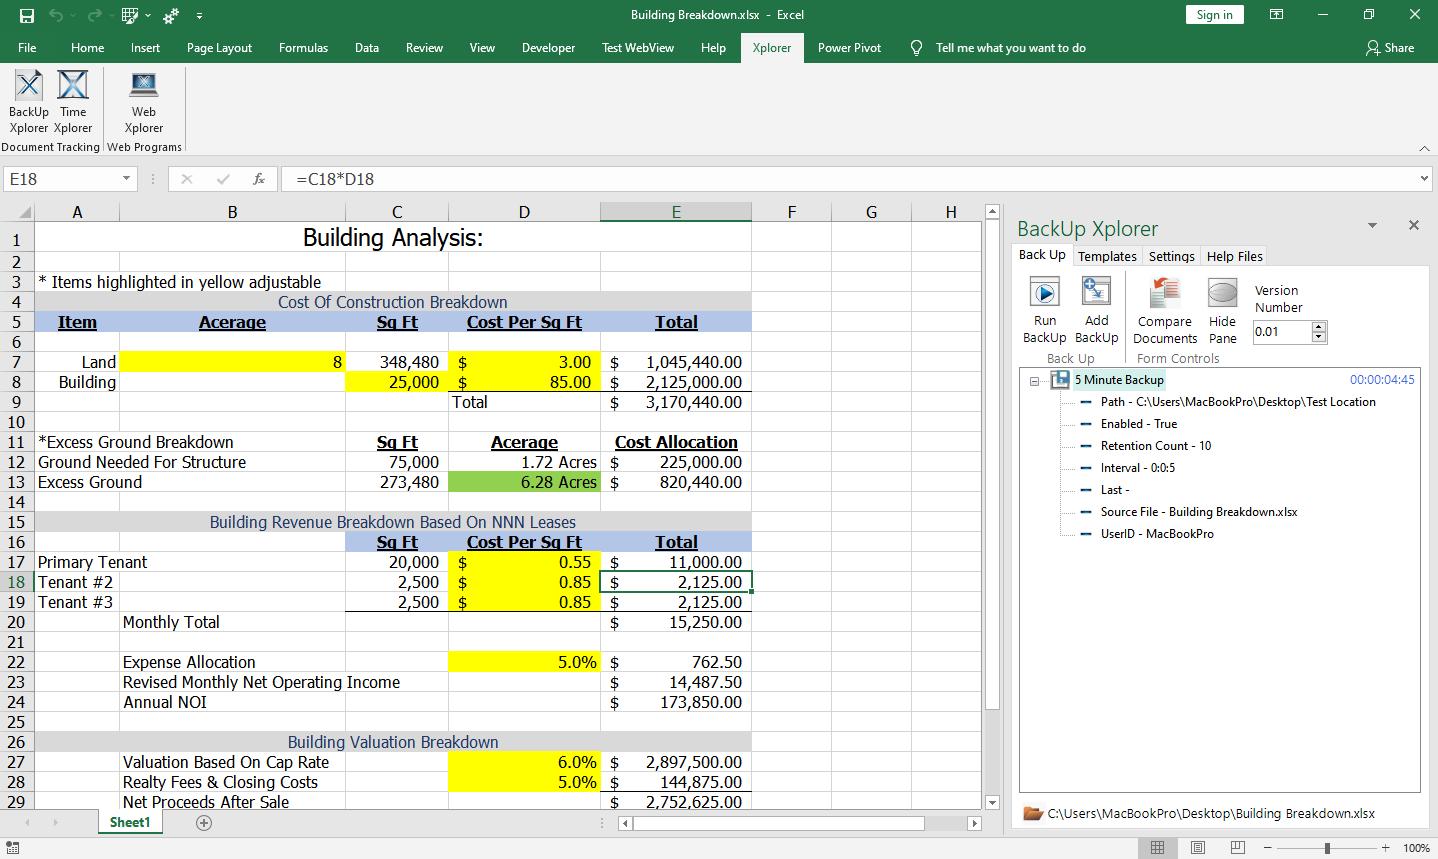 Task pane with Backup Xplorer shown in Microsoft Excel.